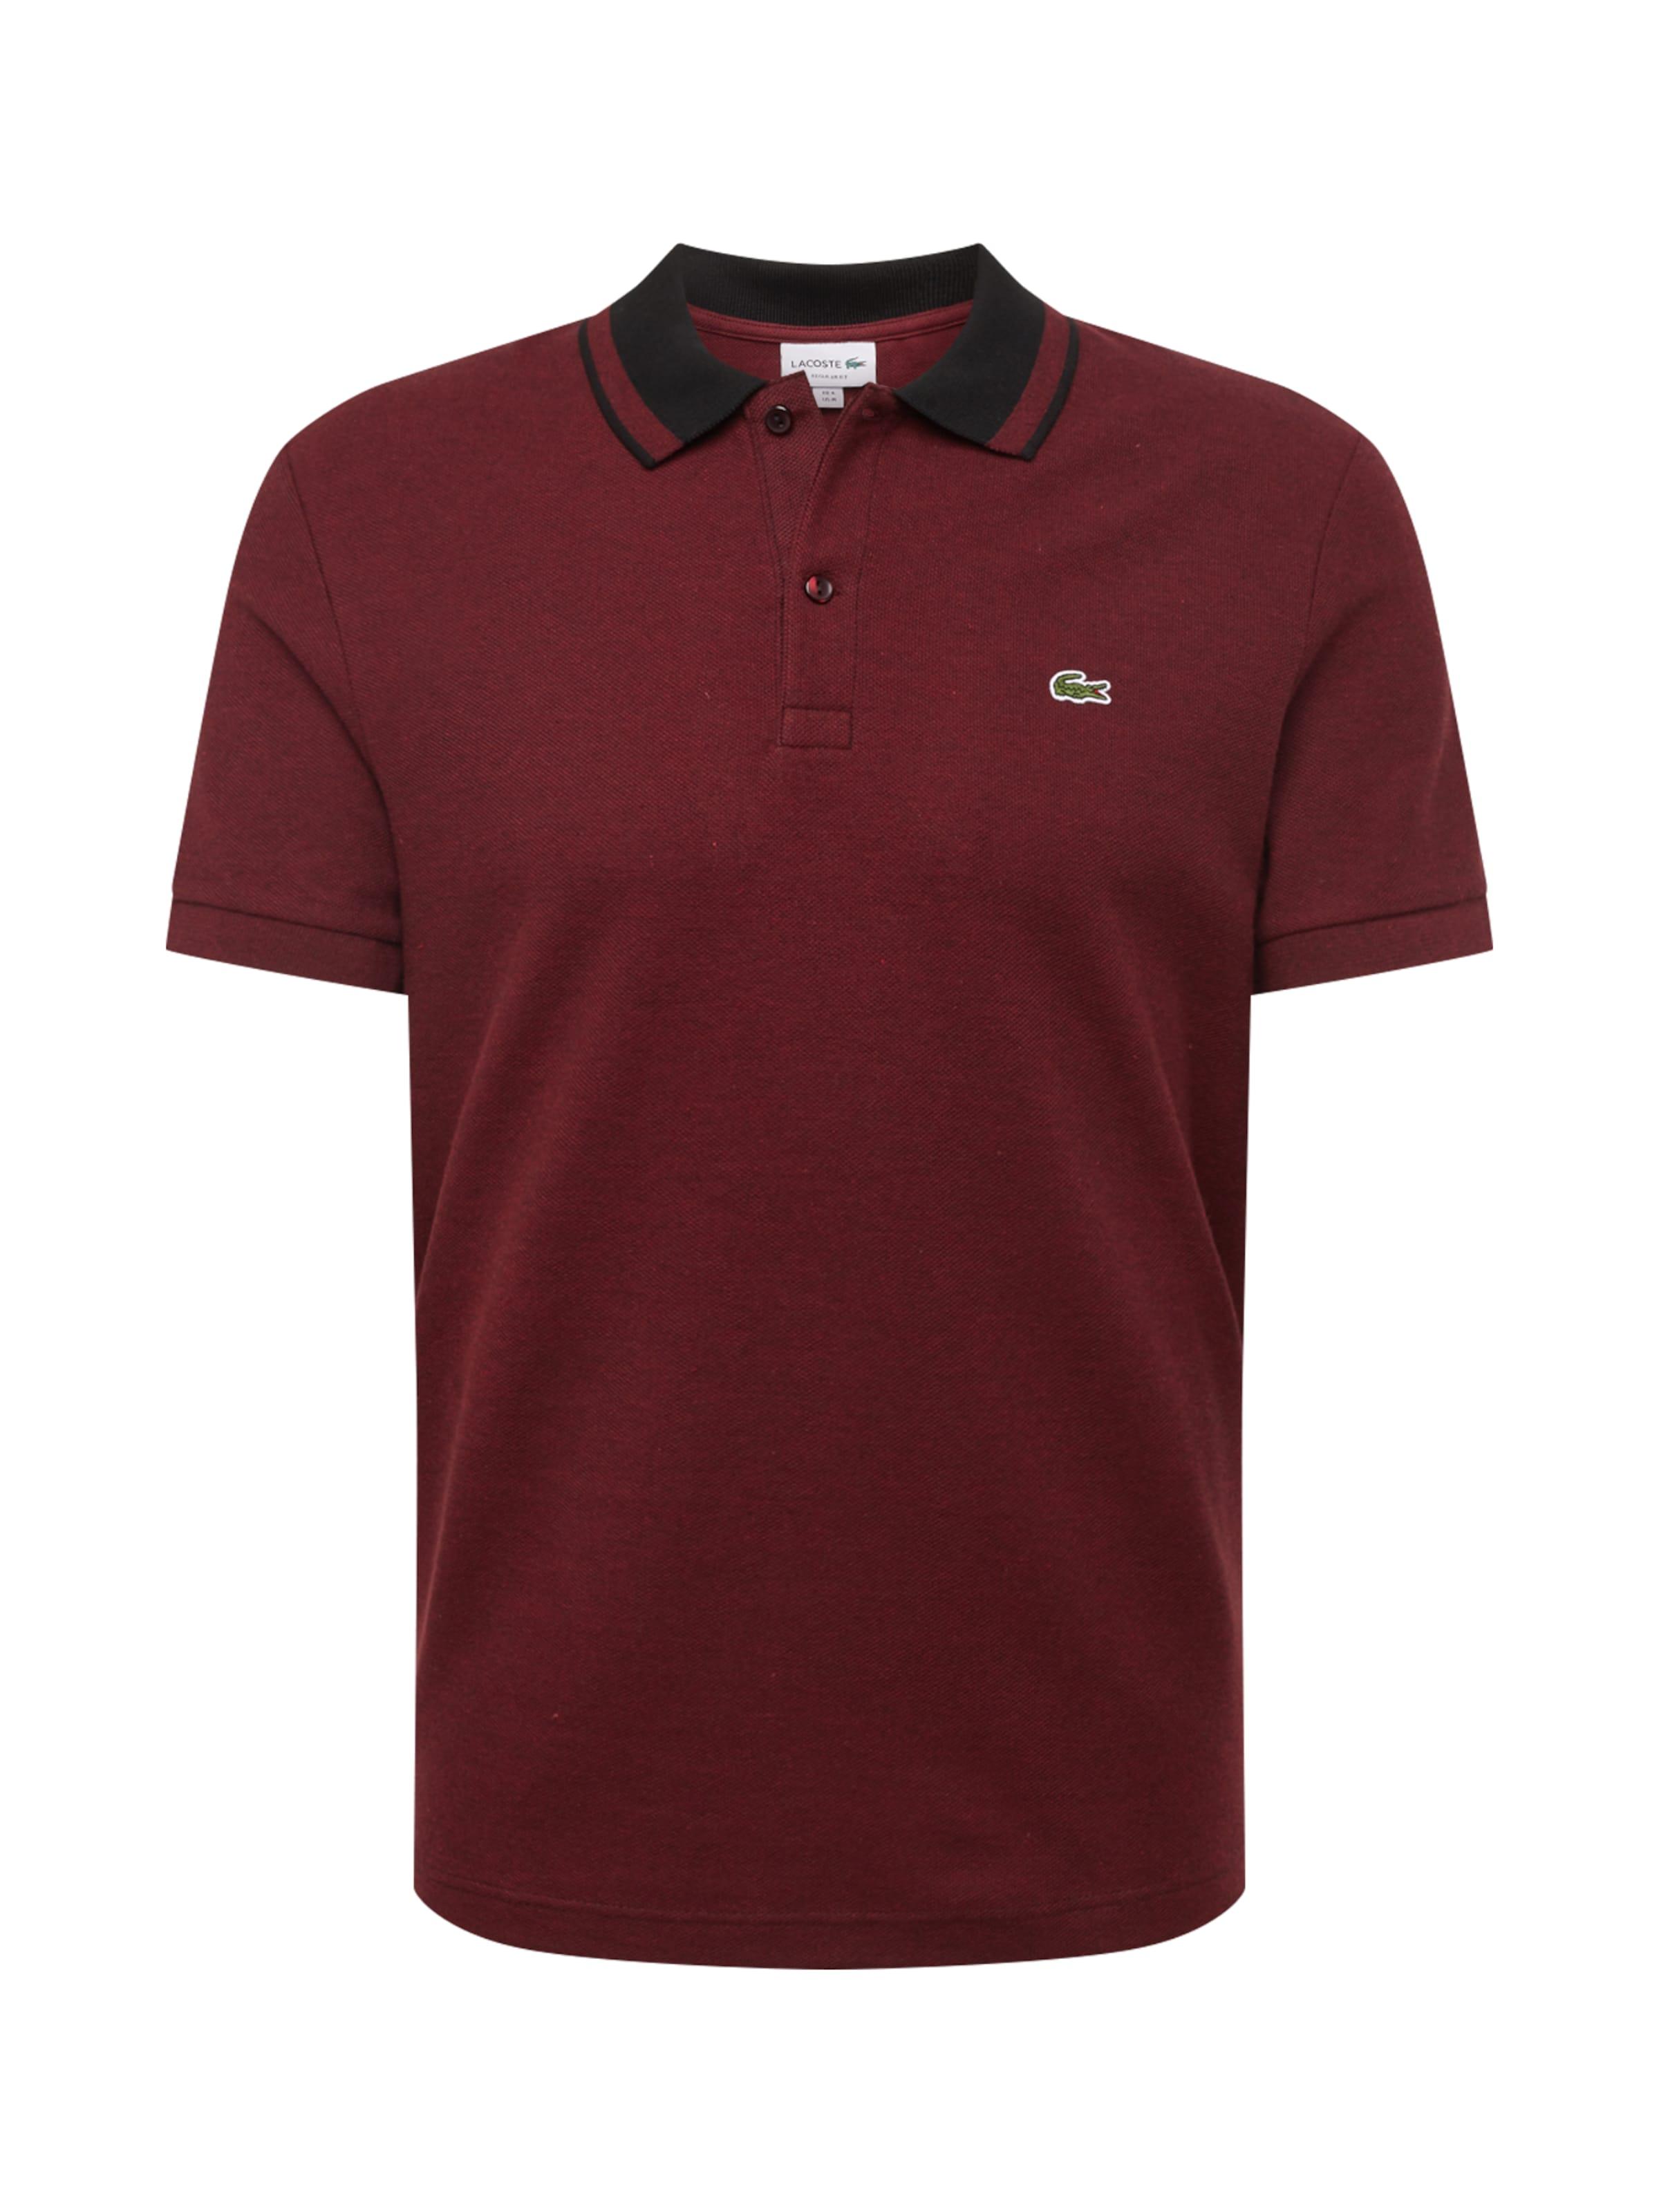 Lacoste shirt En T 'chemise Col cotes Ma' Bord Indigo N0wP8OXnkZ